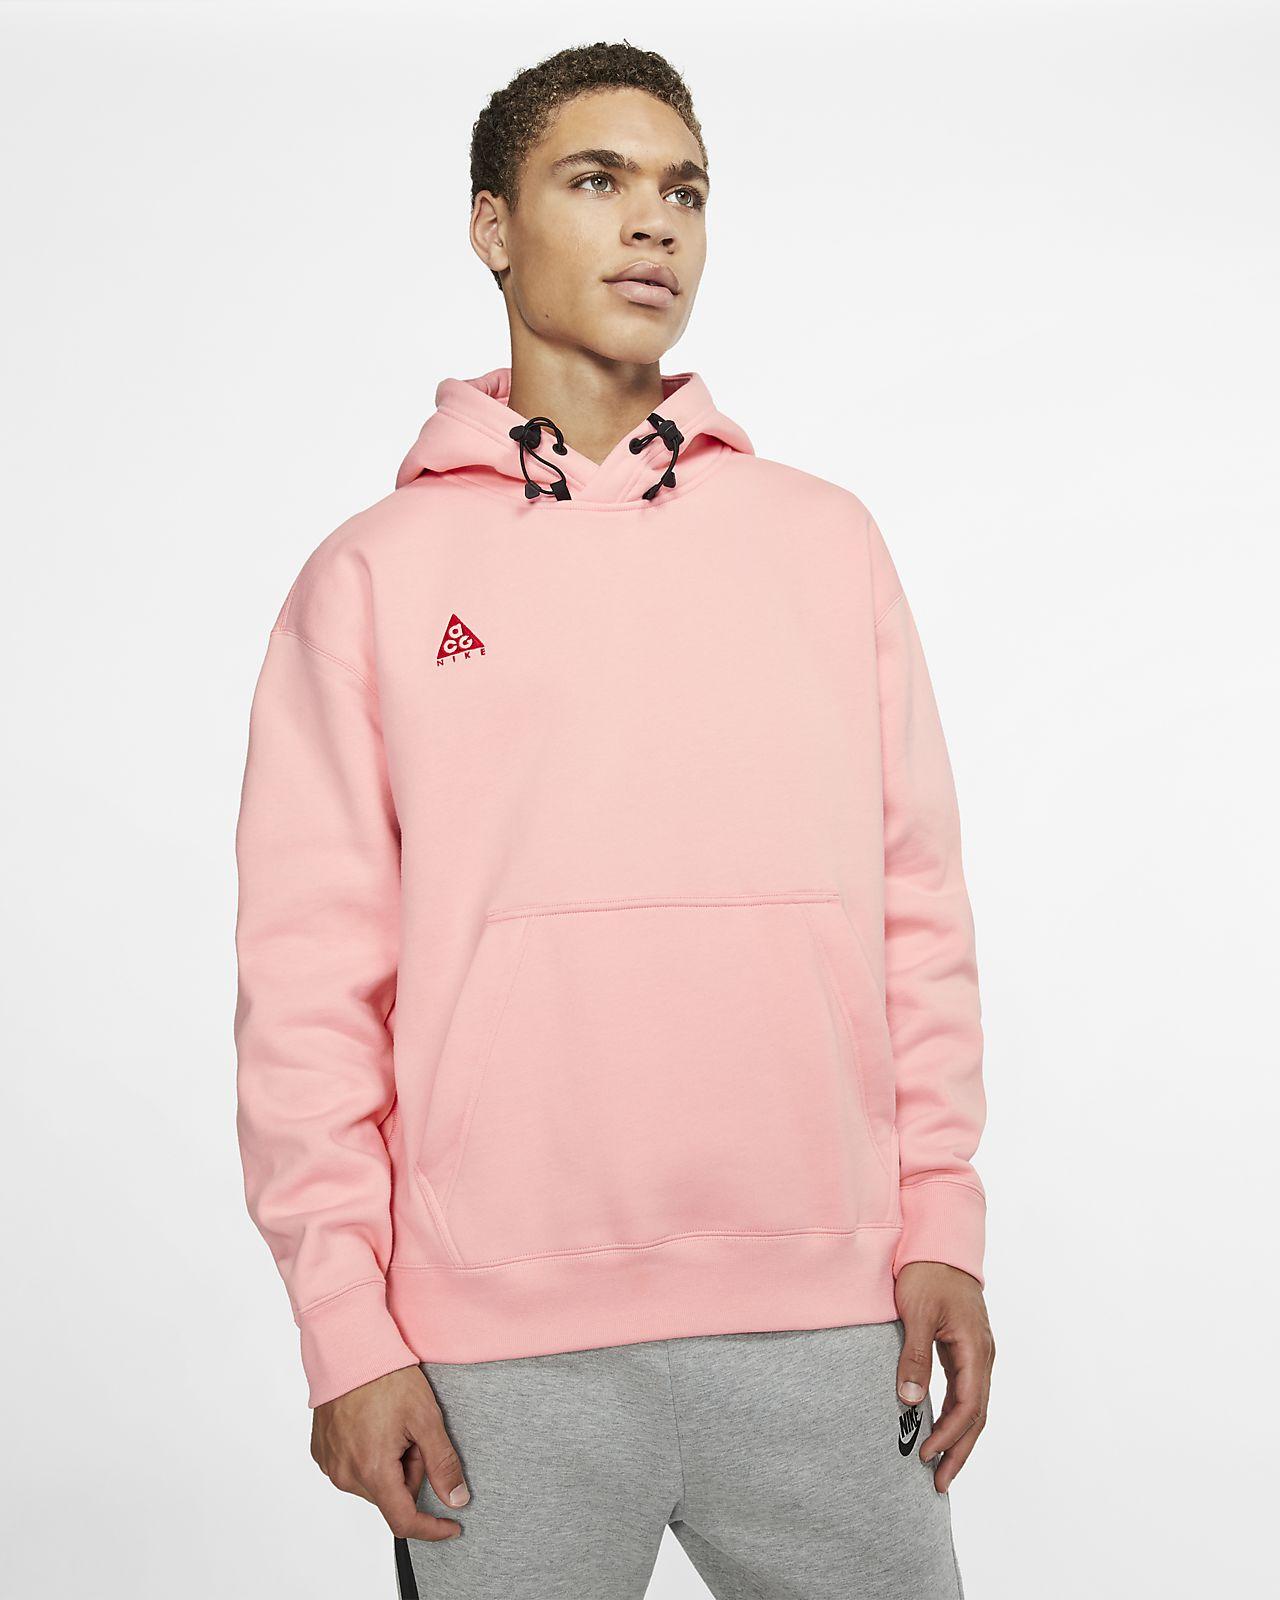 cheaper 7f6c5 0513e Nike ACG Pullover Hoodie